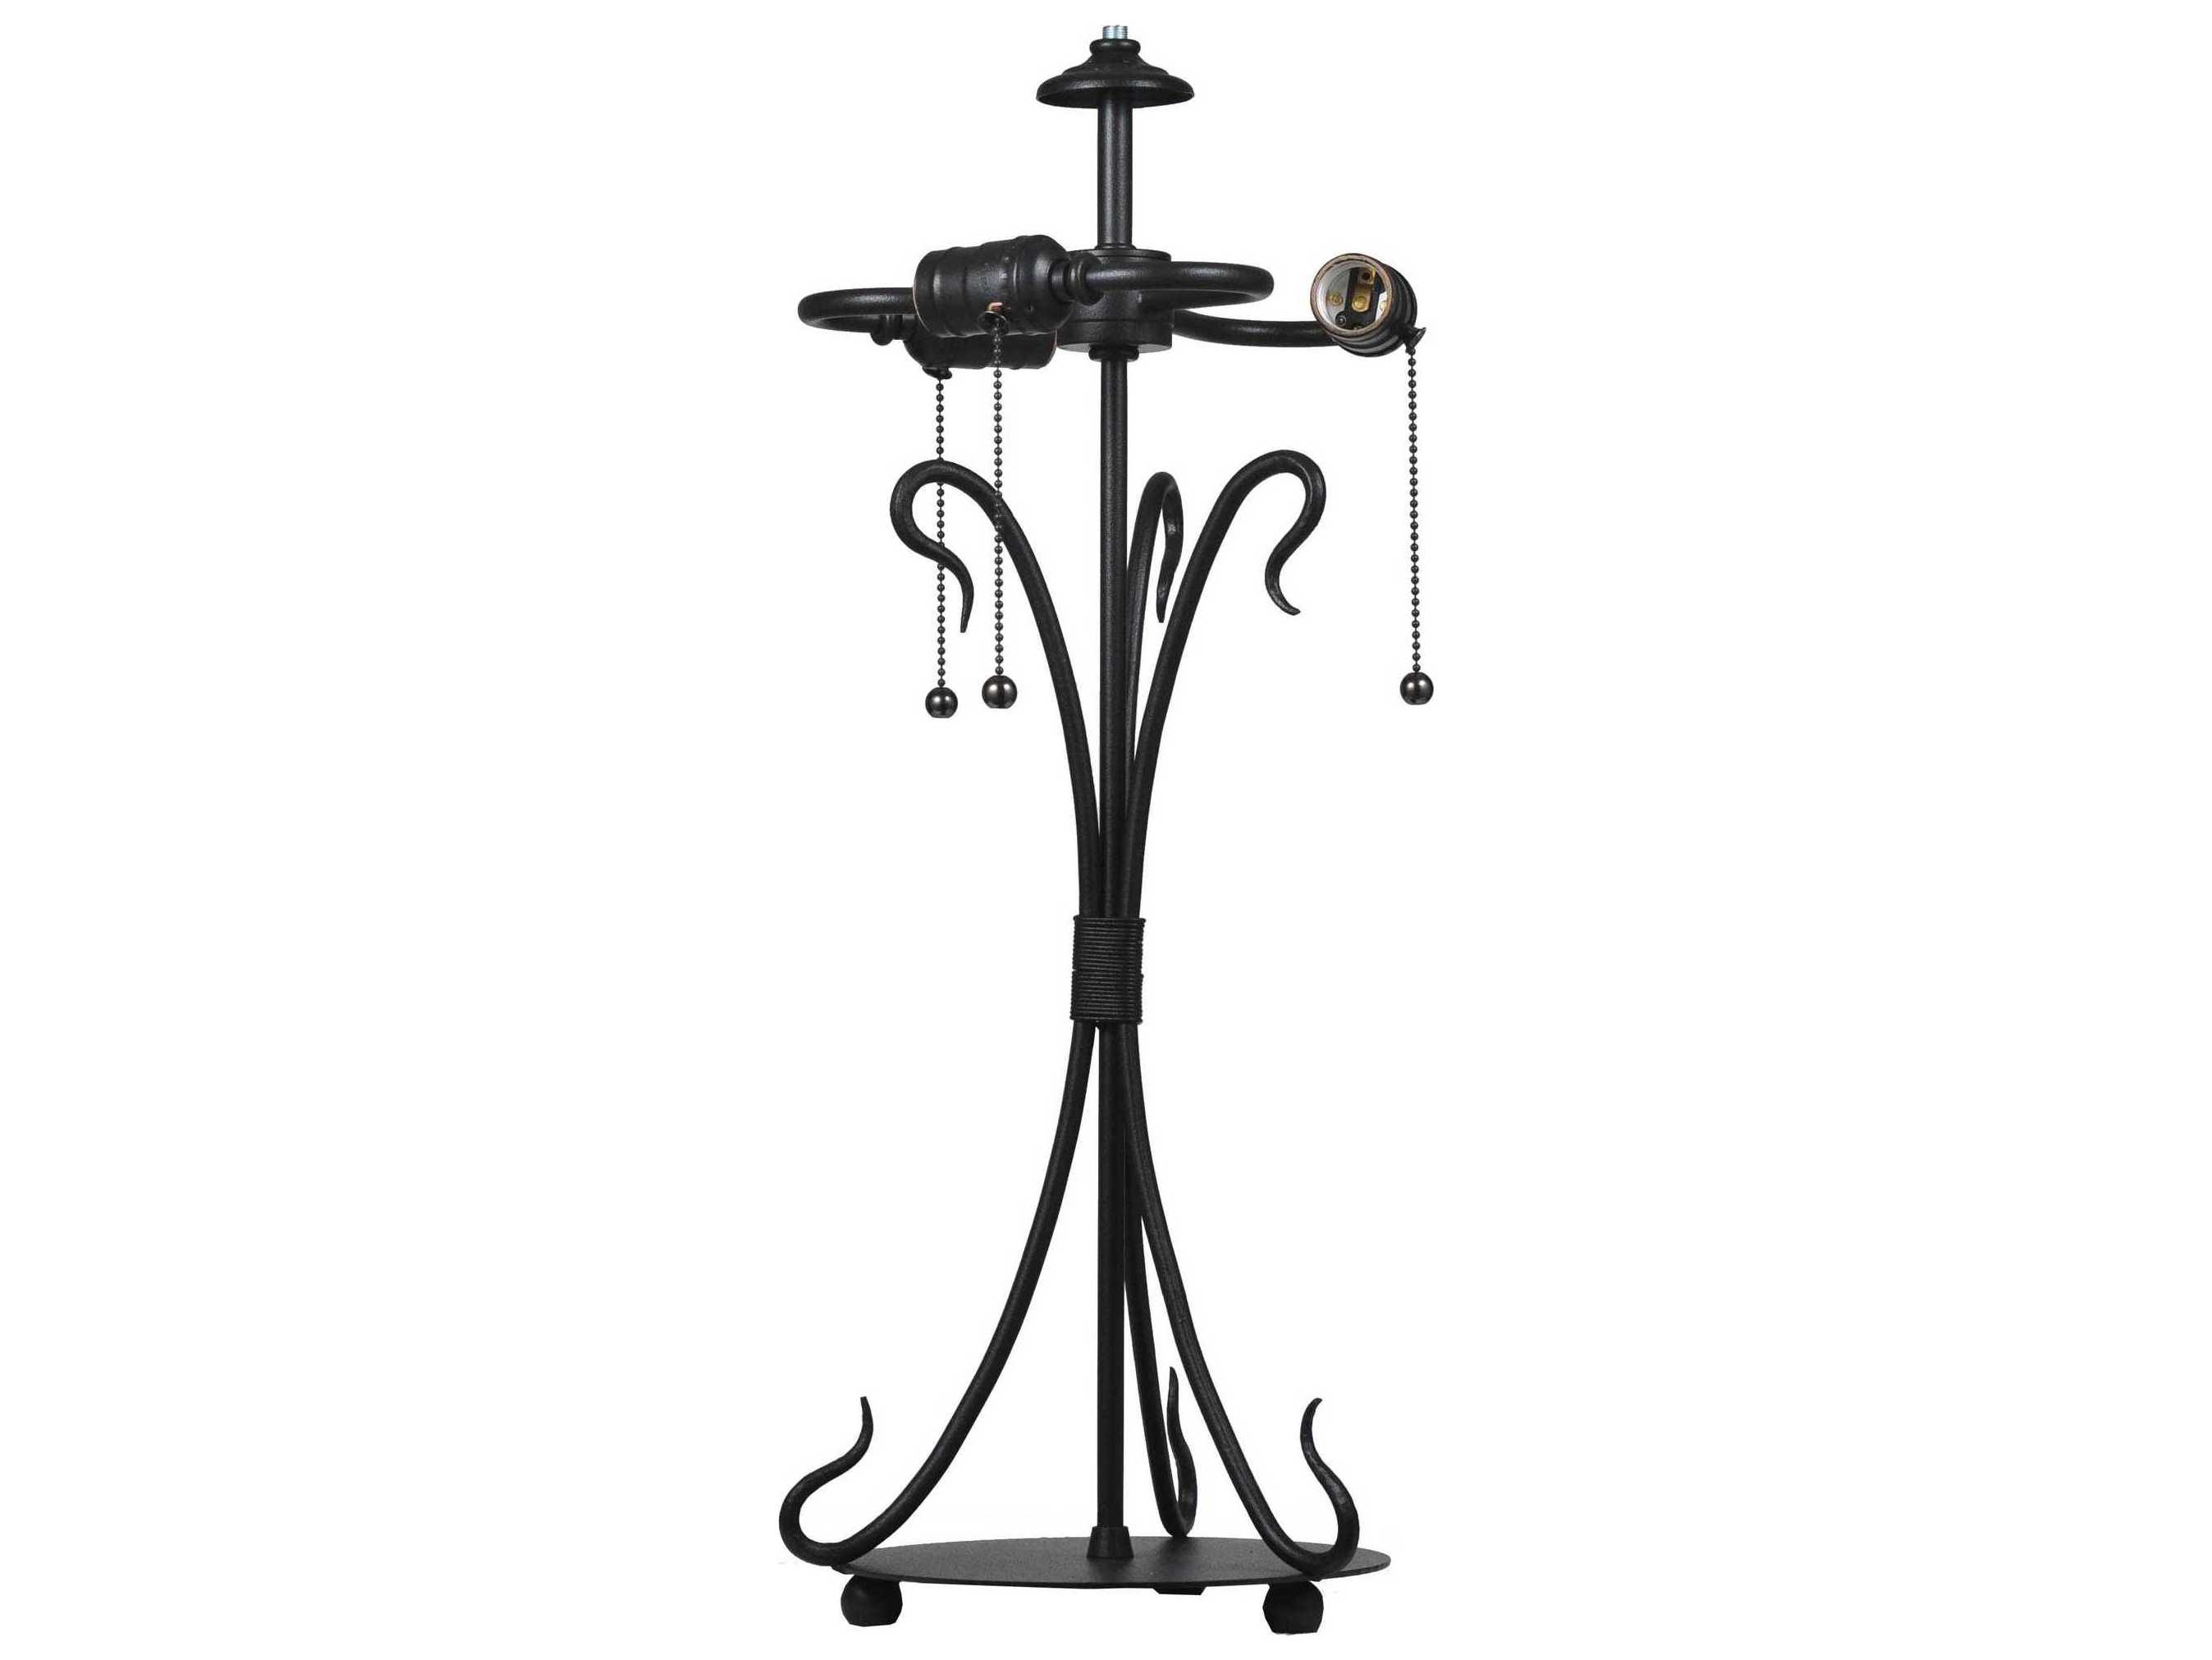 Meyda Tiffany Wrought Iron Table Lamp Base My108405